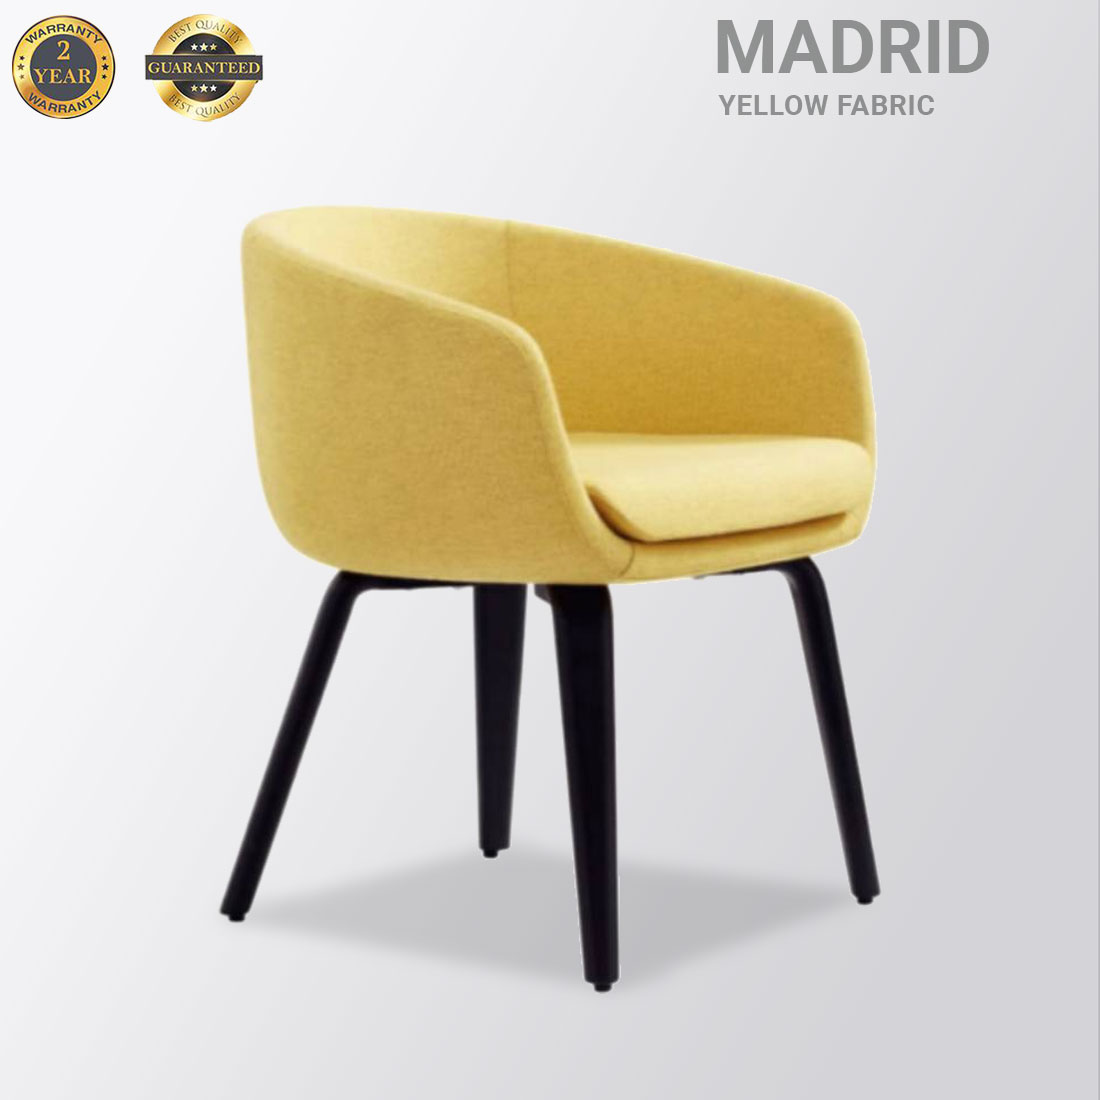 Madrid Fabric Yellow